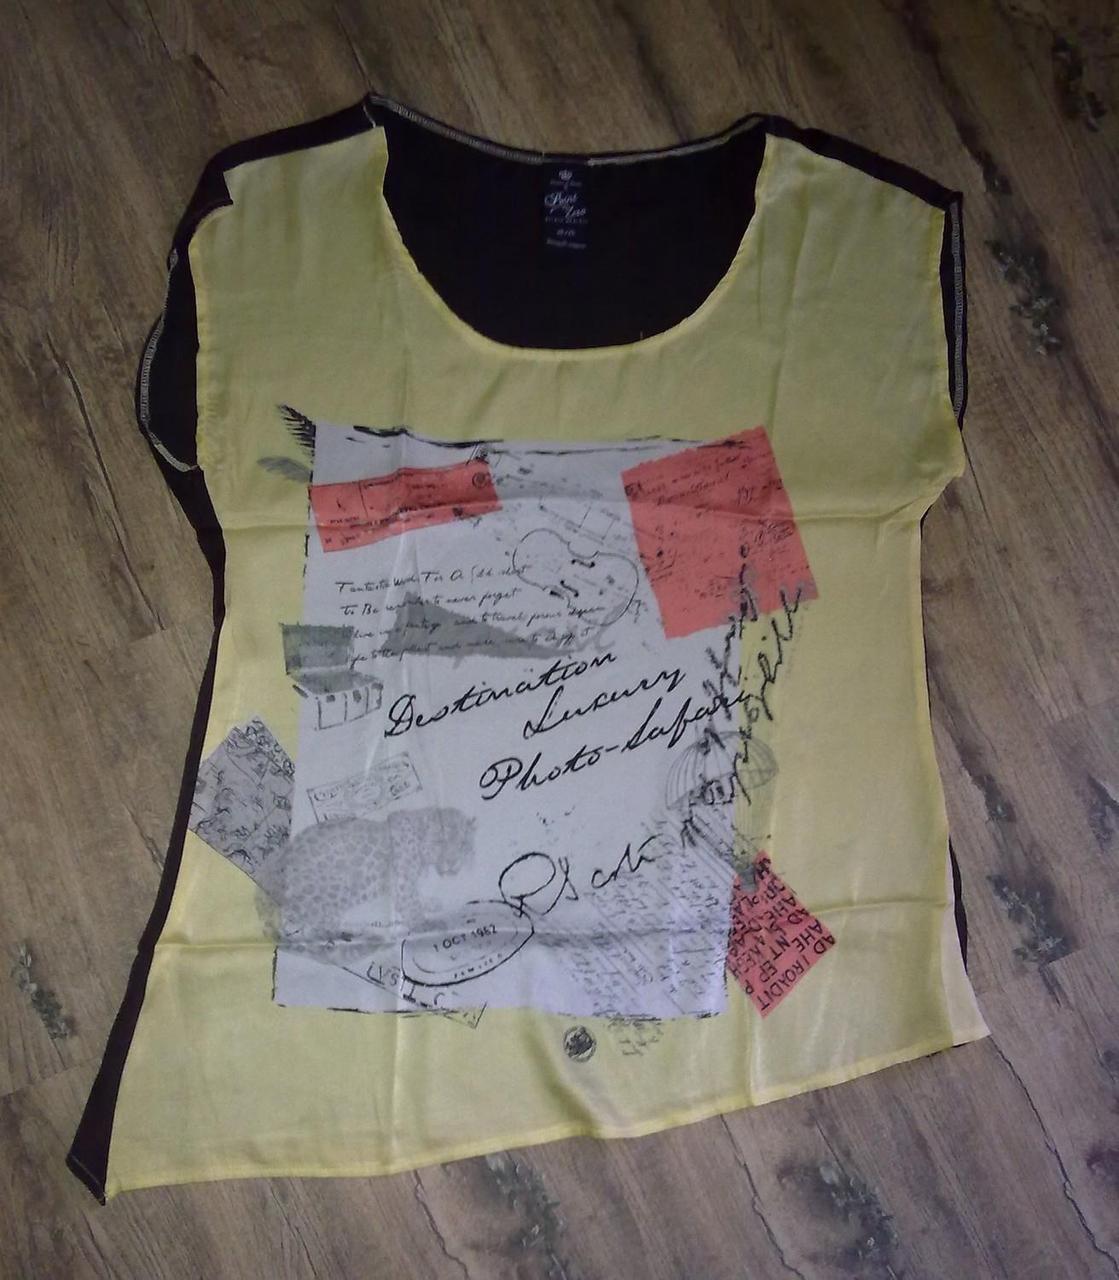 Сатиновая блузка канадского бренда Point Zero